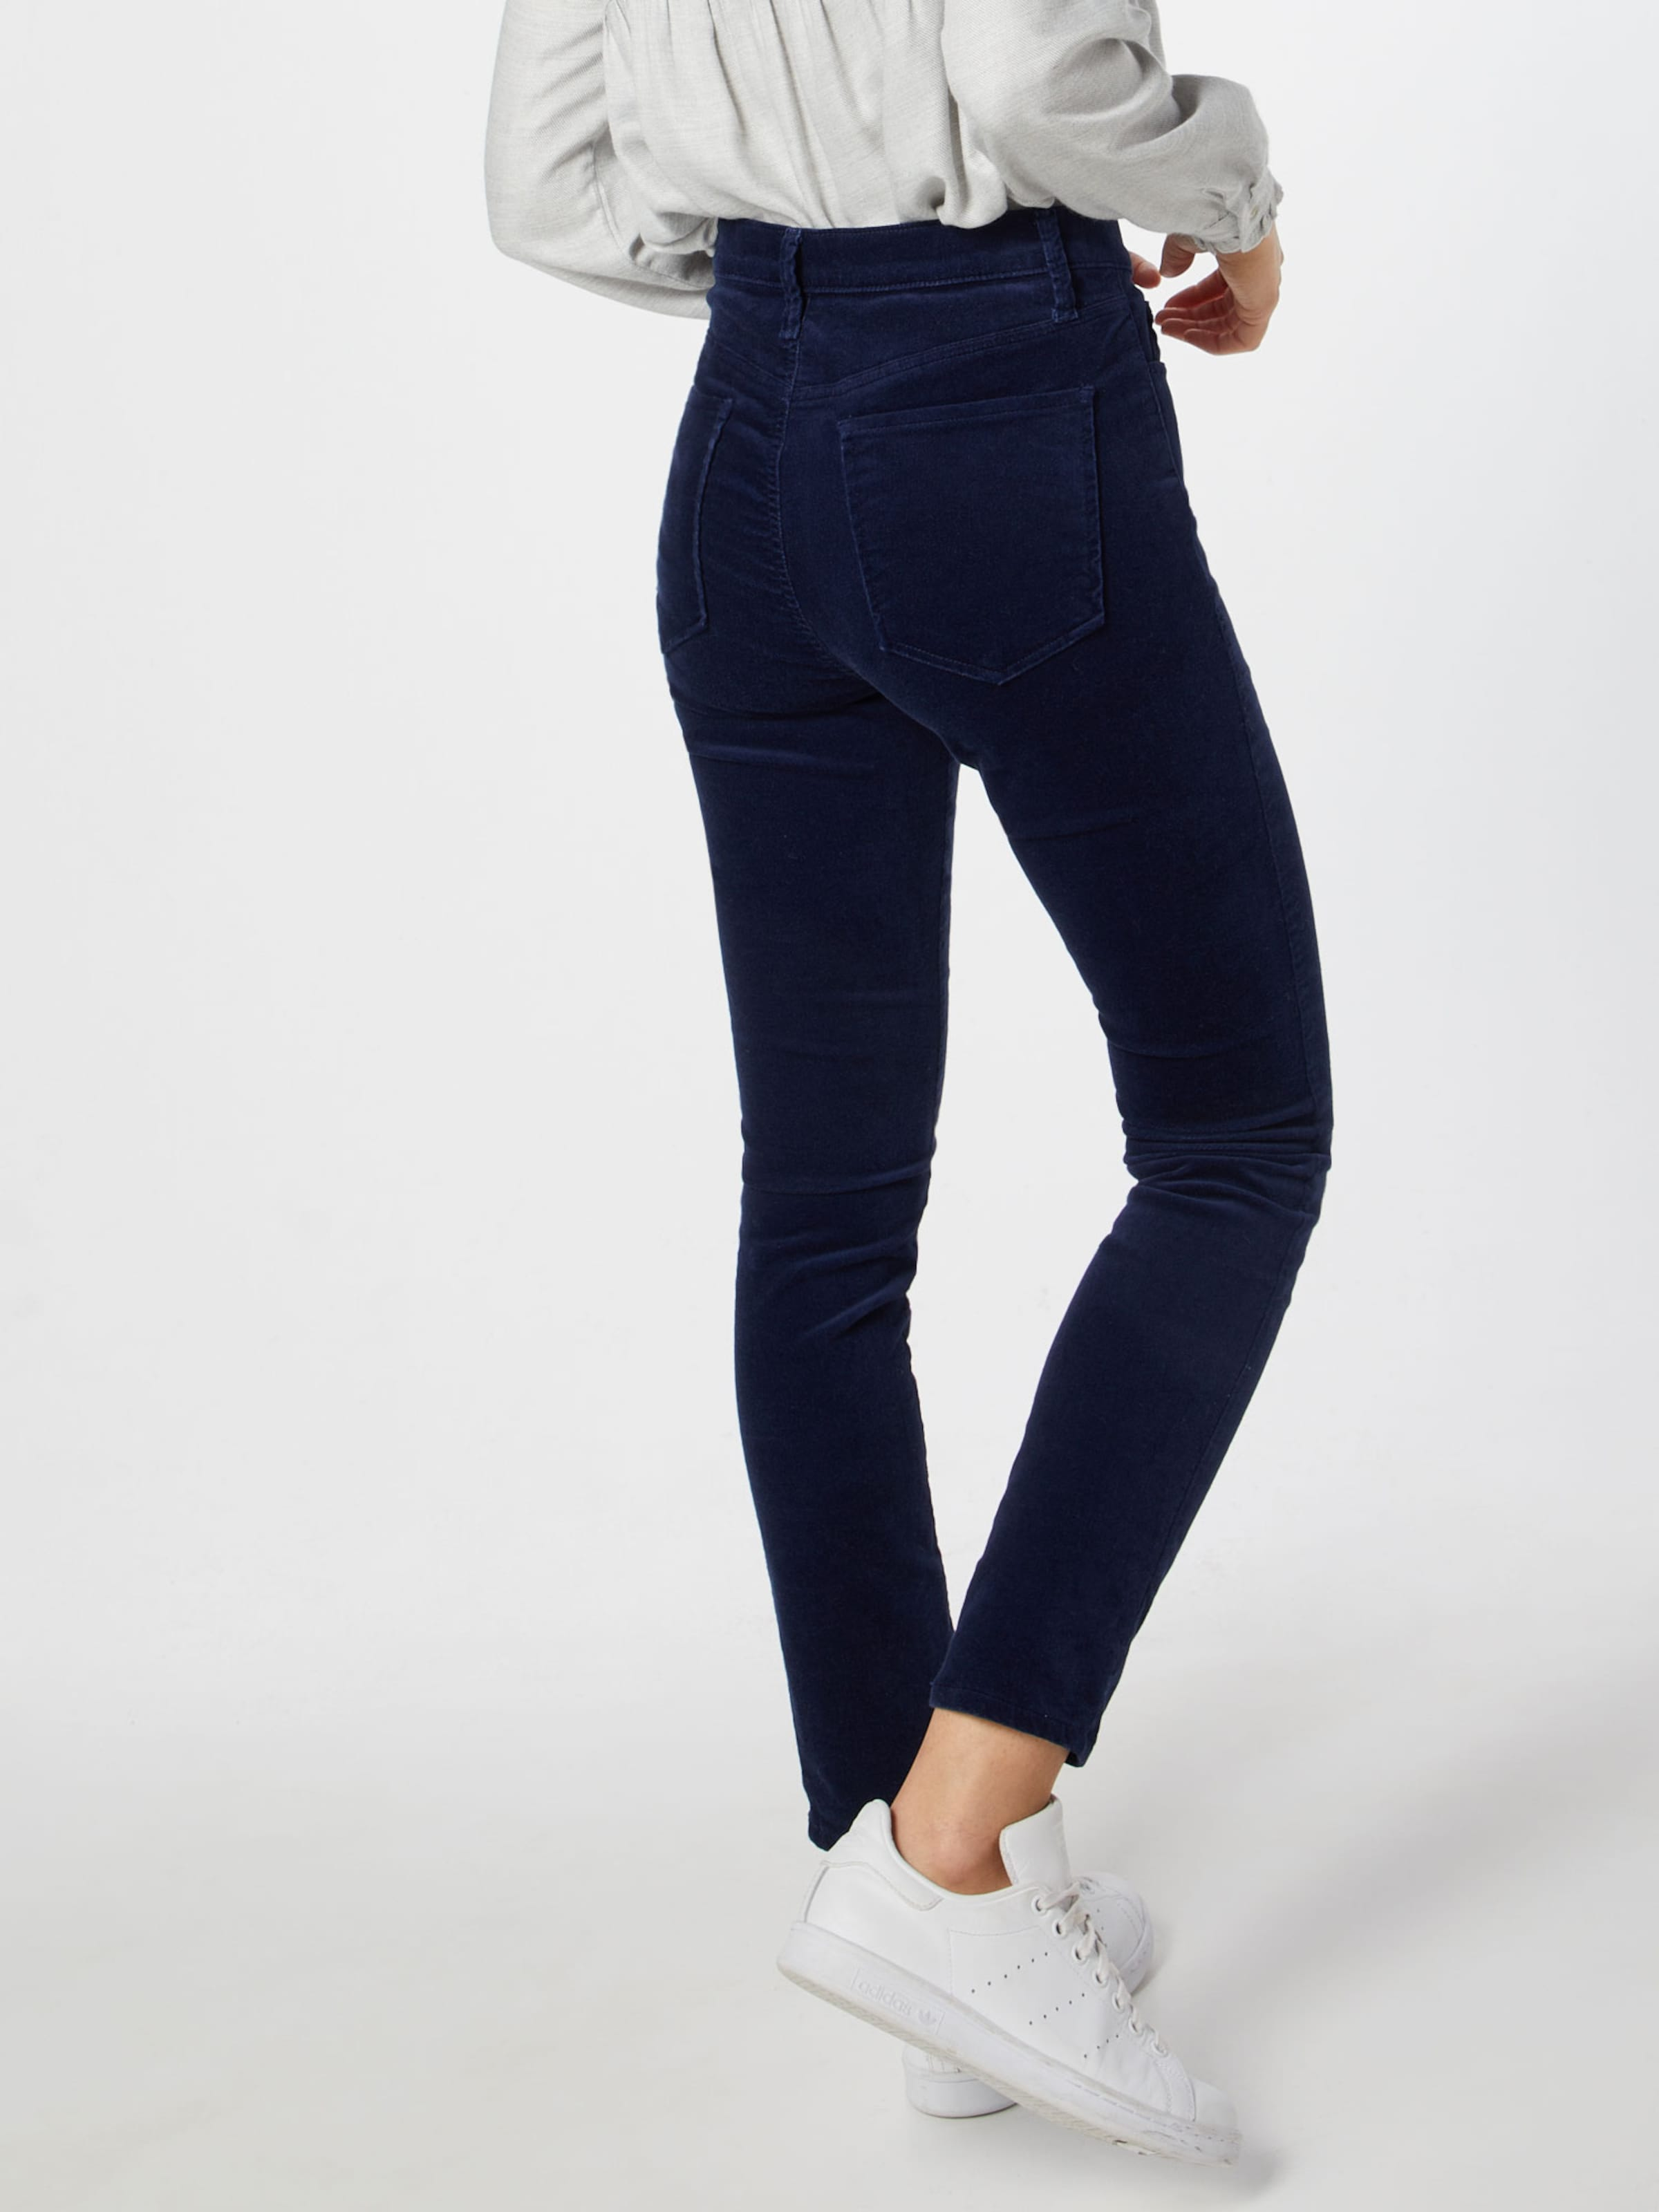 In Skinny Ankle Blau Gap Velvet' Hr Jeans 'tr 8XNPn0Okw